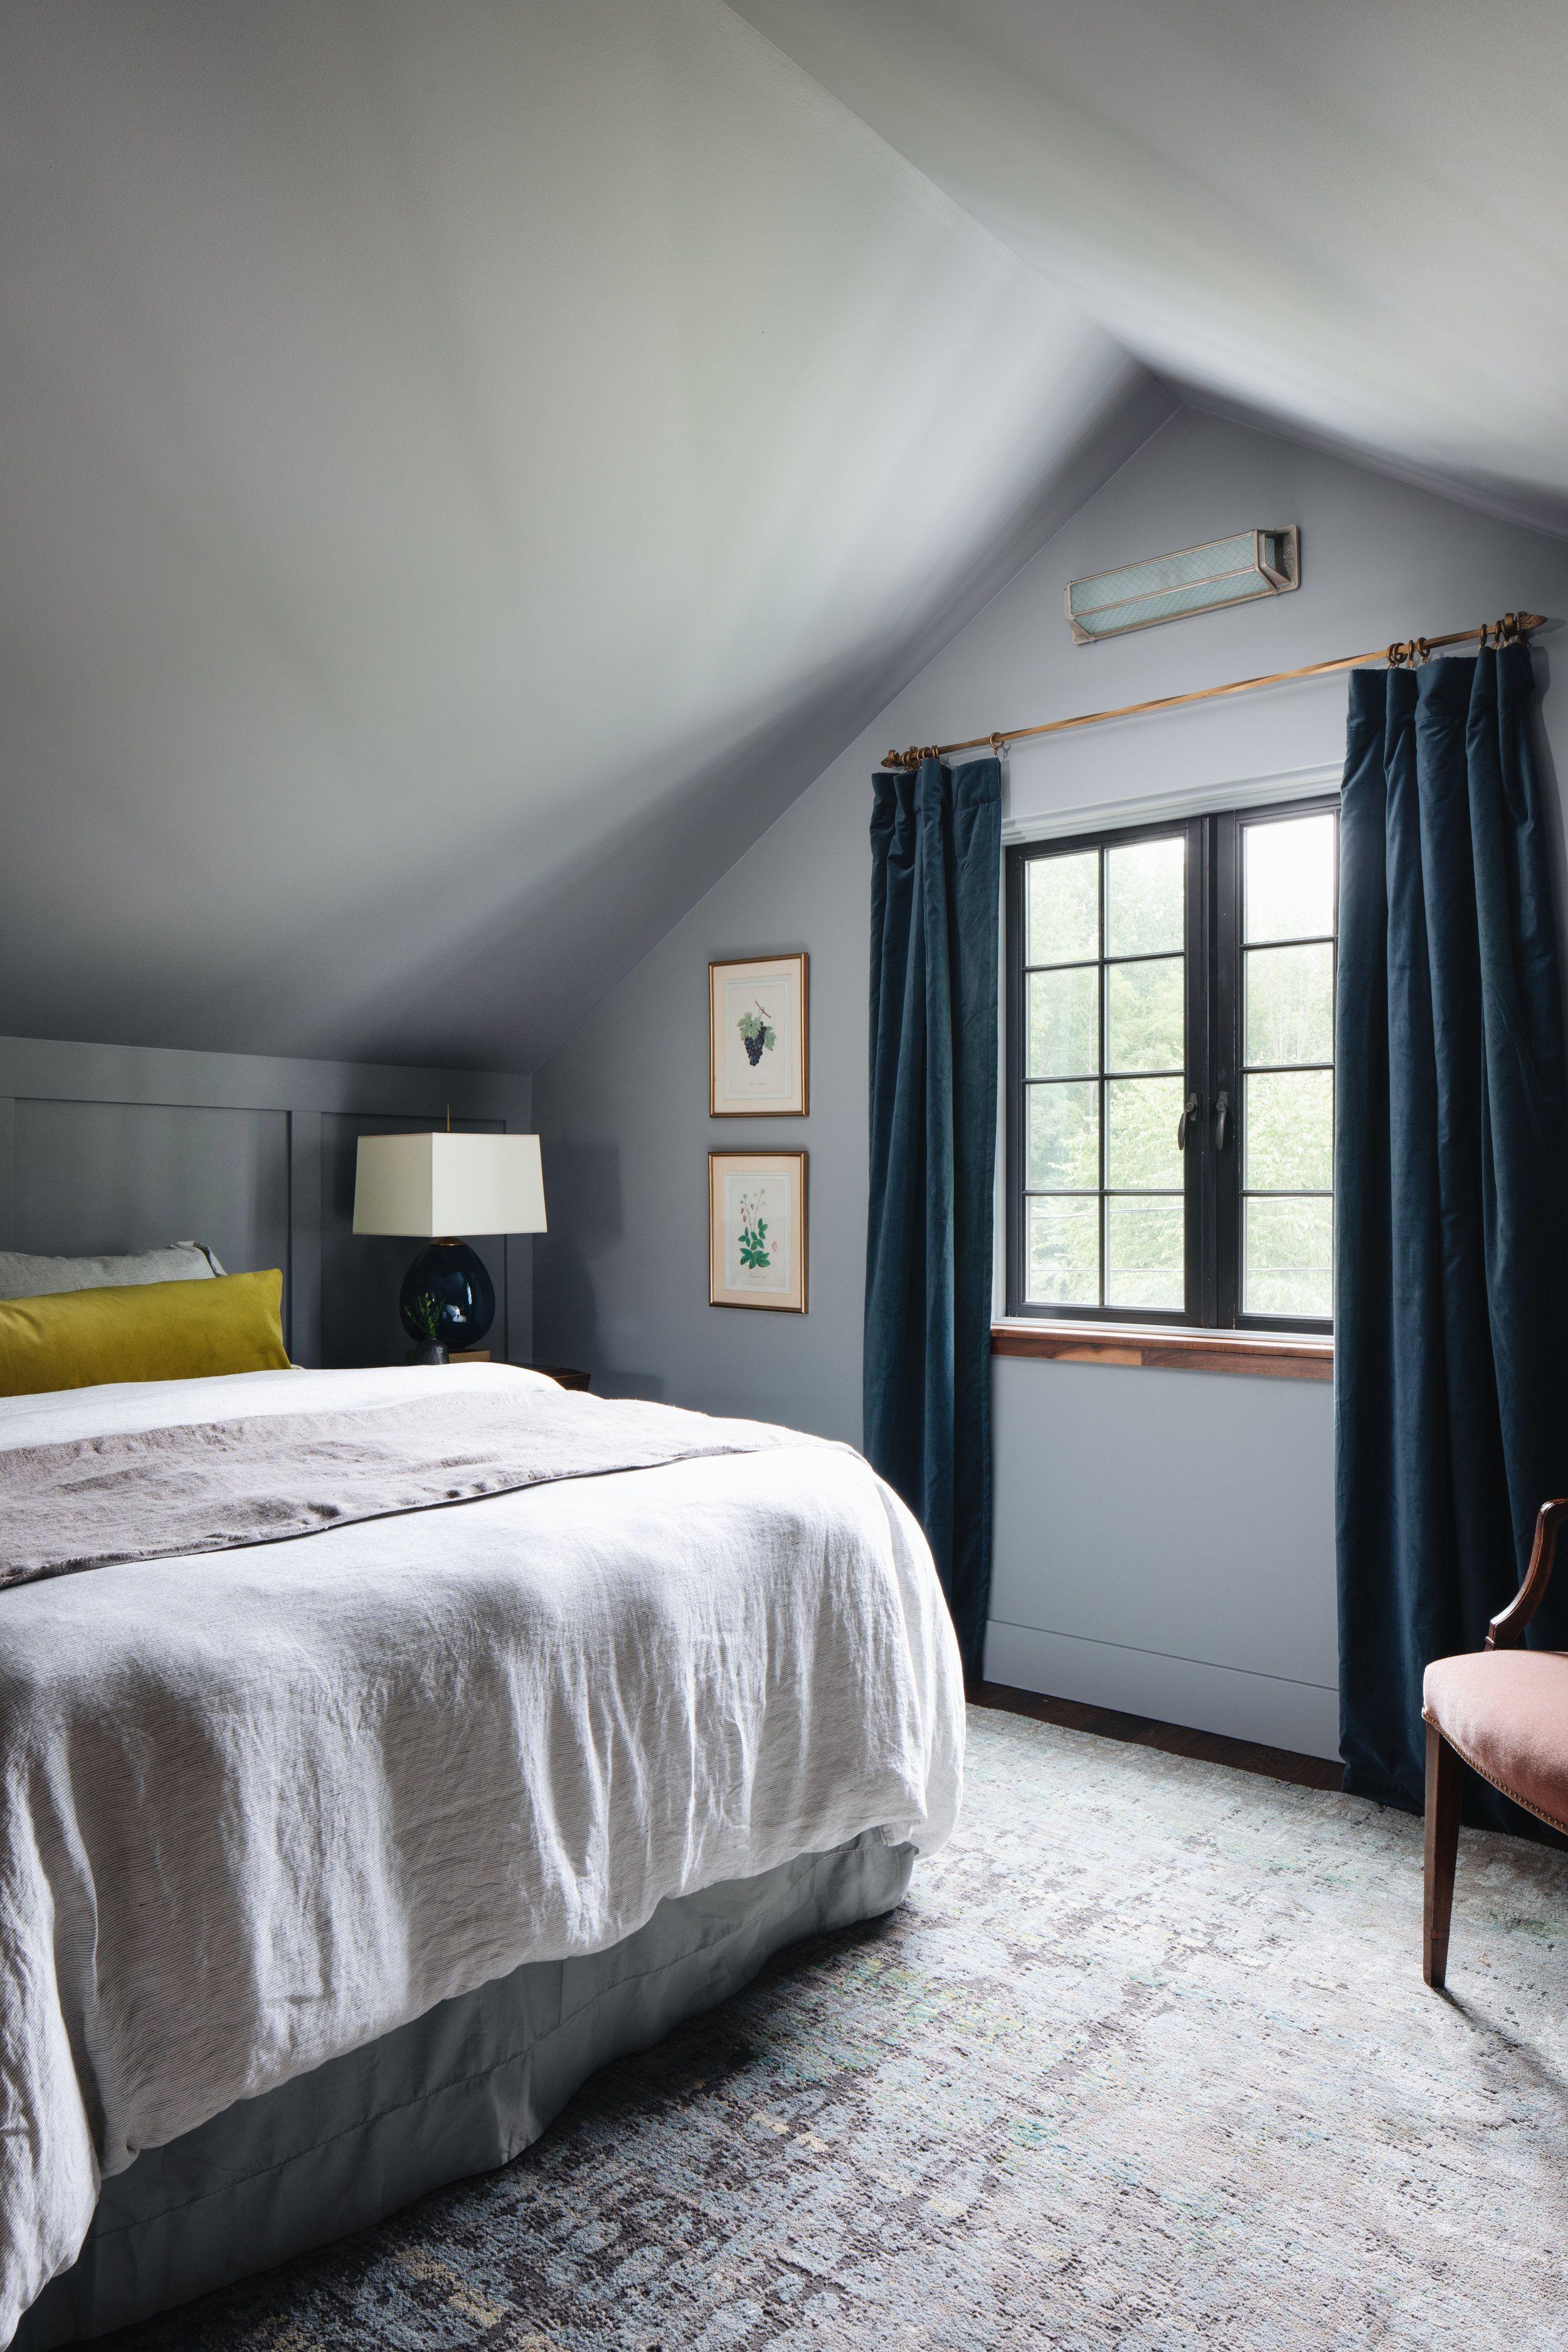 Bedroom Dark Walls Dark Curtains Dark Window Panes Linen